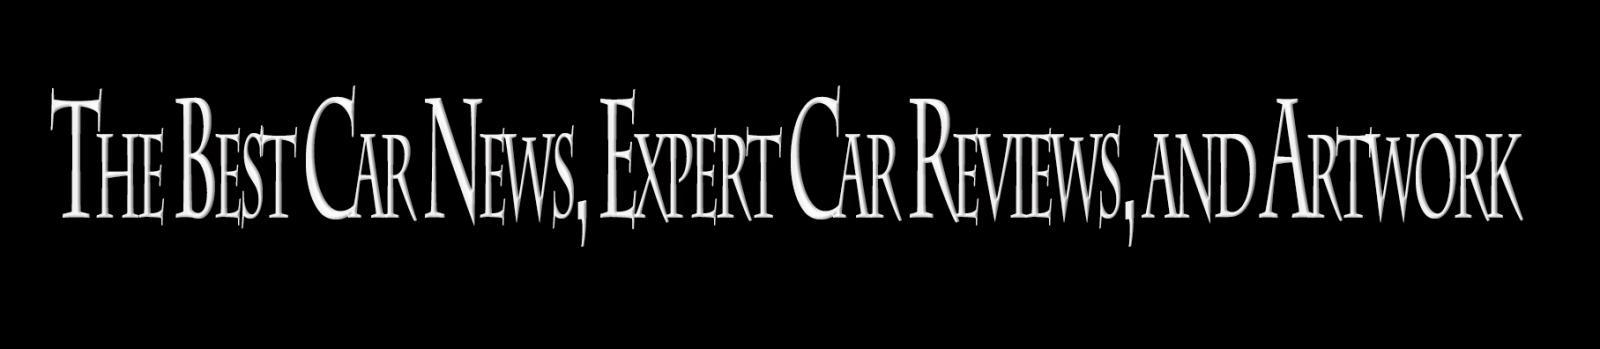 LEADERBOARD-CAR-REVS-DAILY-2221